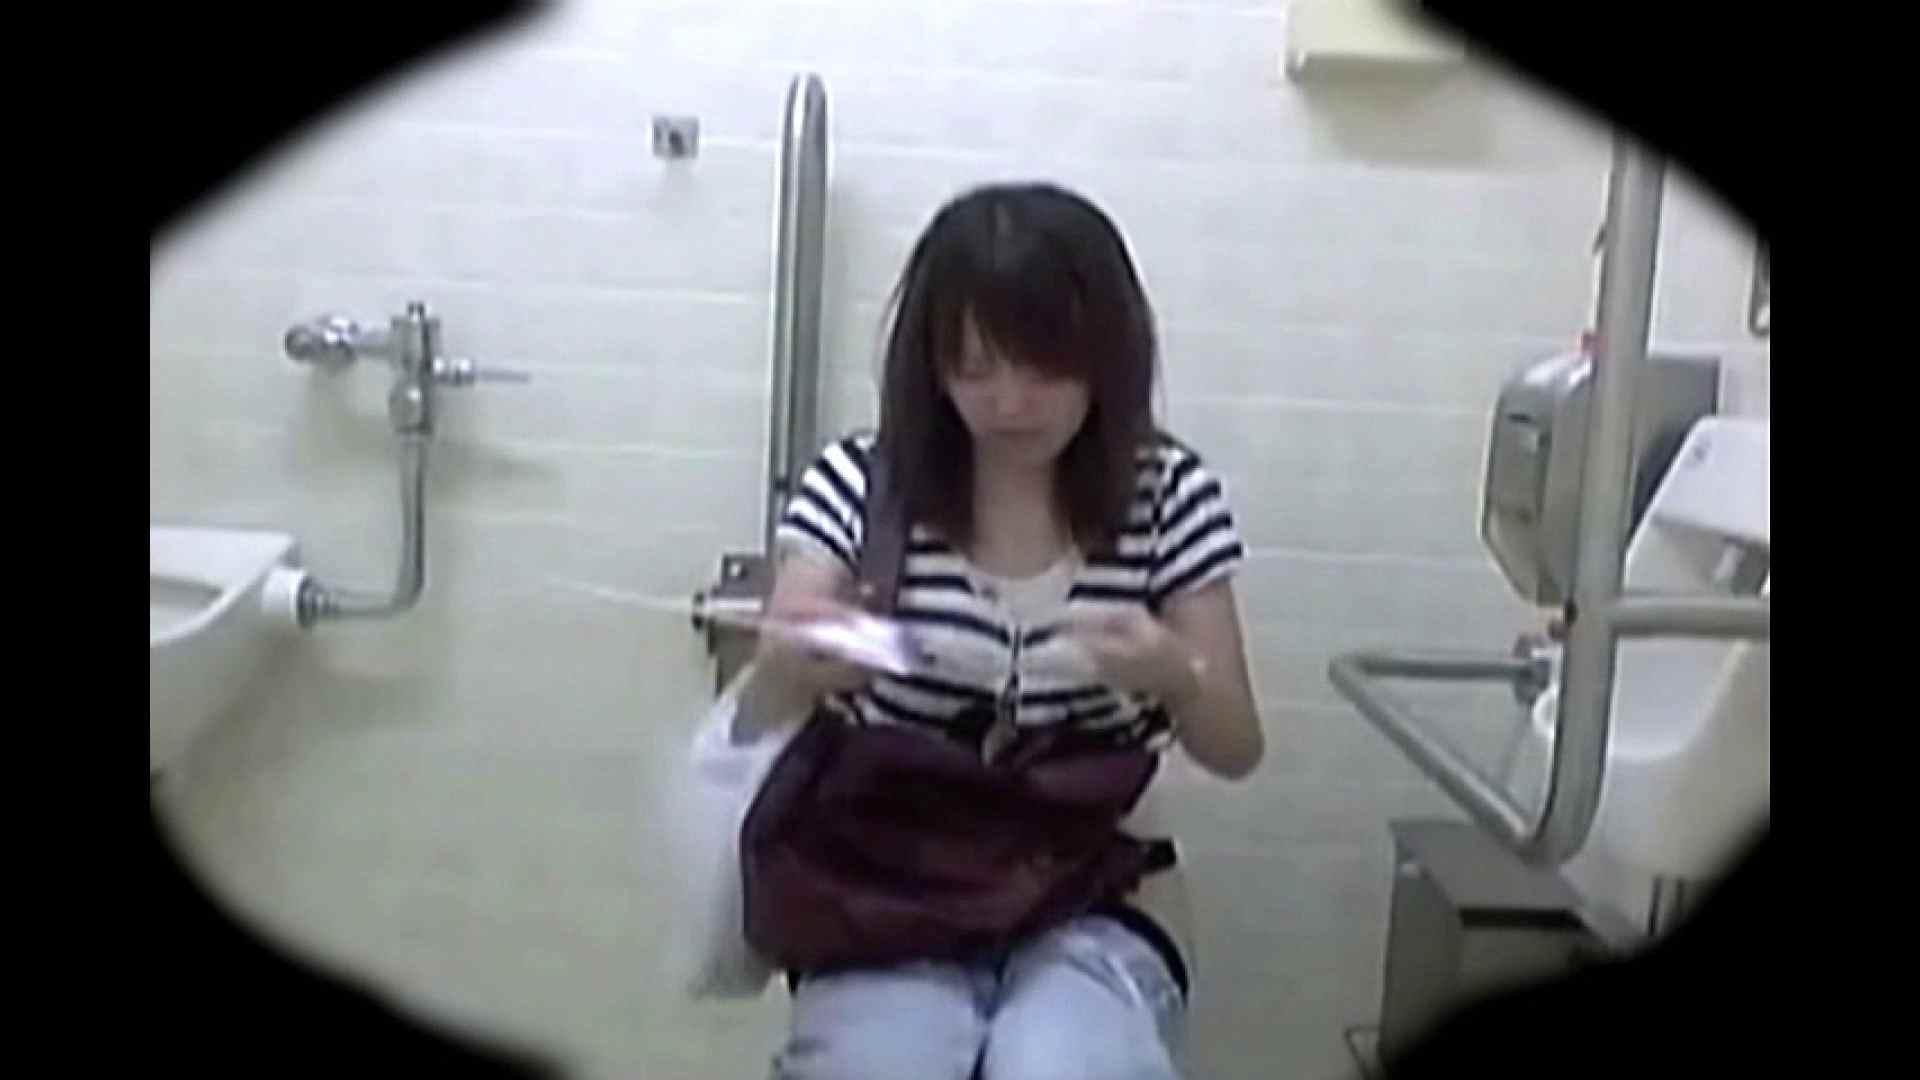 teen galトイレ覗き紙がナイ編‼vol.06 OLのエロ生活  82連発 60